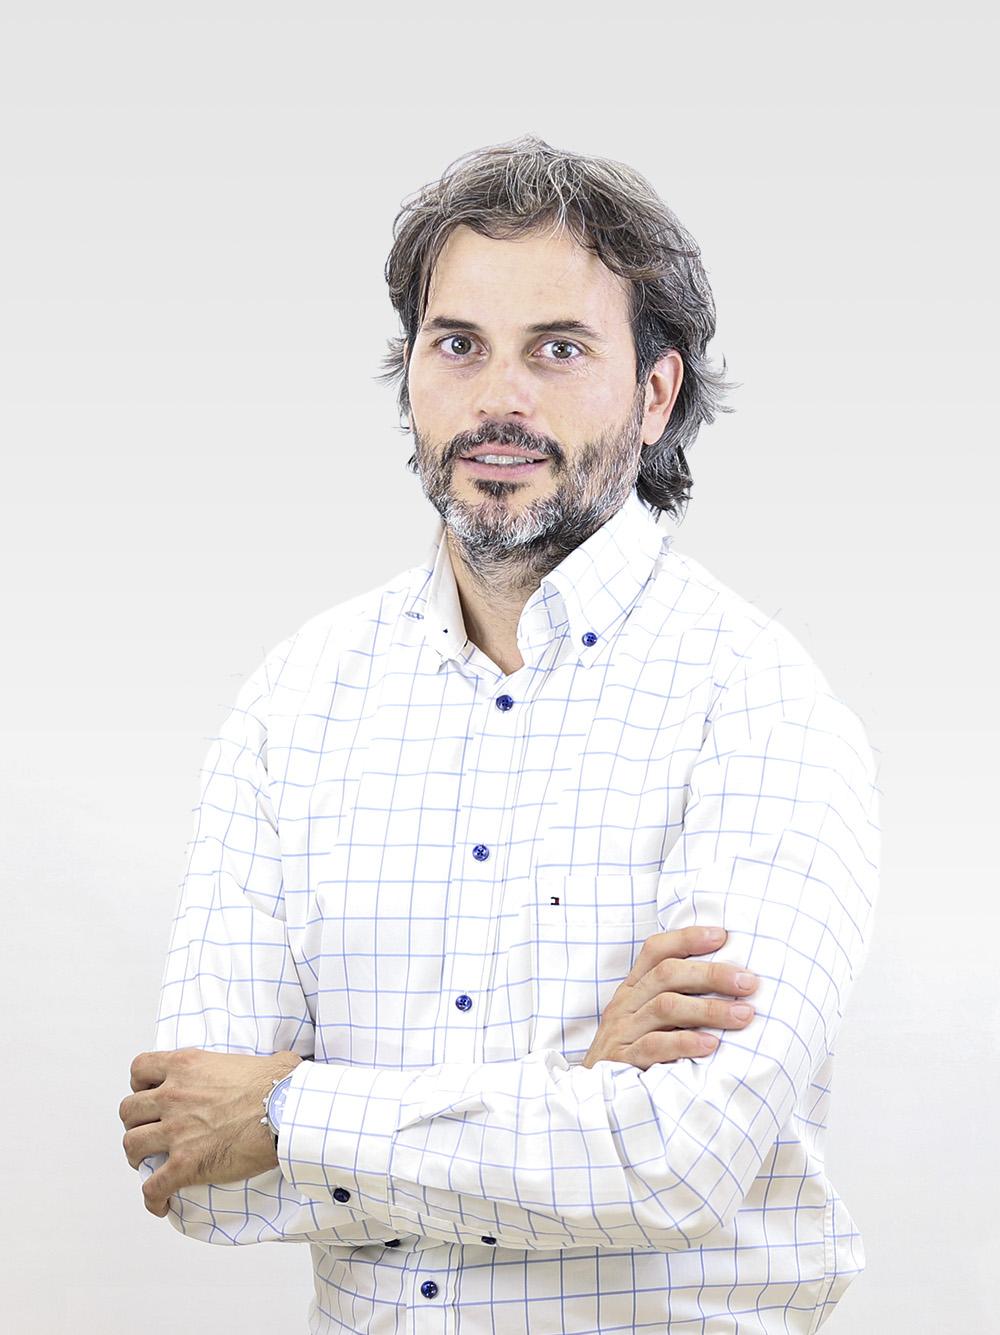 Lucas García Llamas